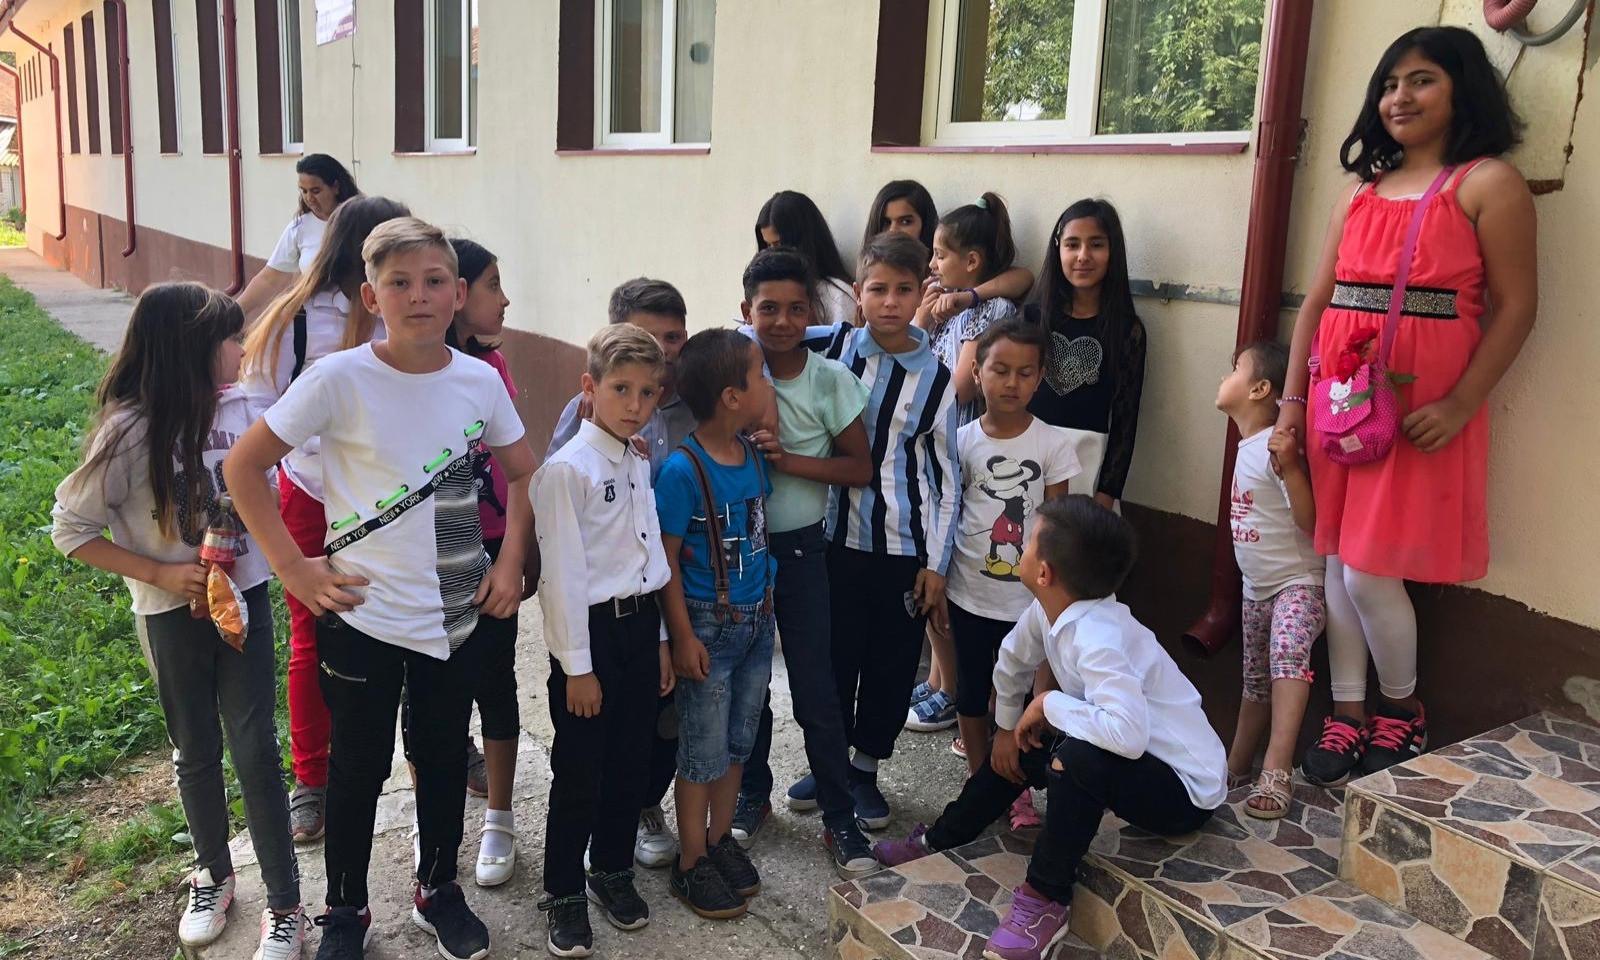 SERVING ROMANIA